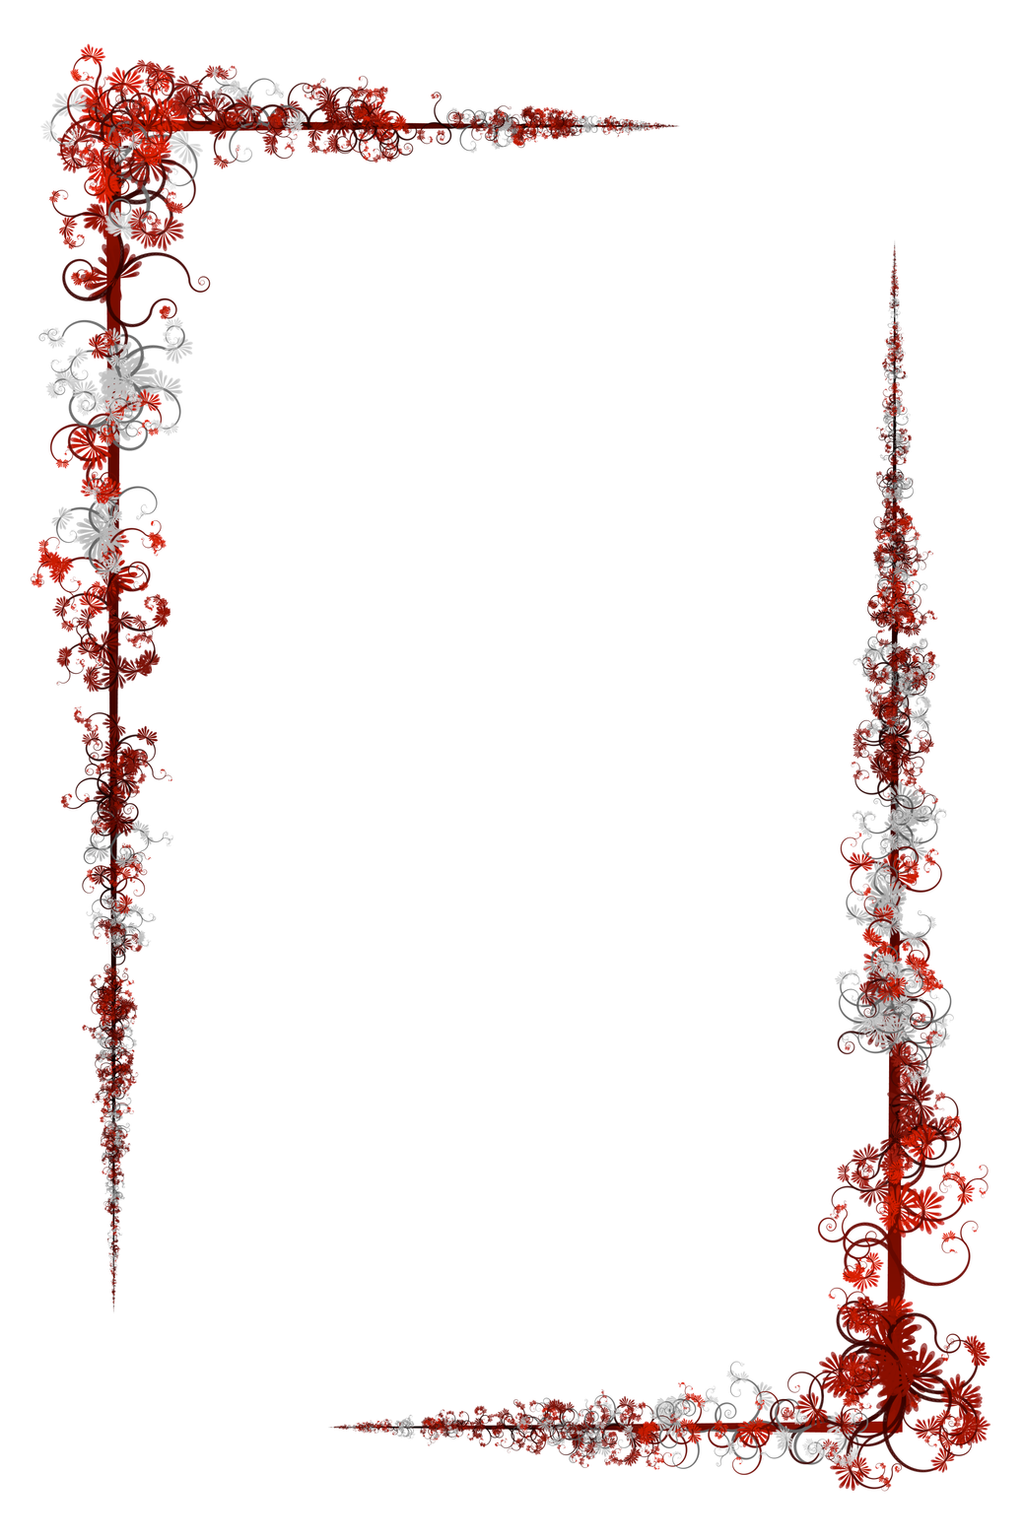 floral border by lunarbunnies on deviantart